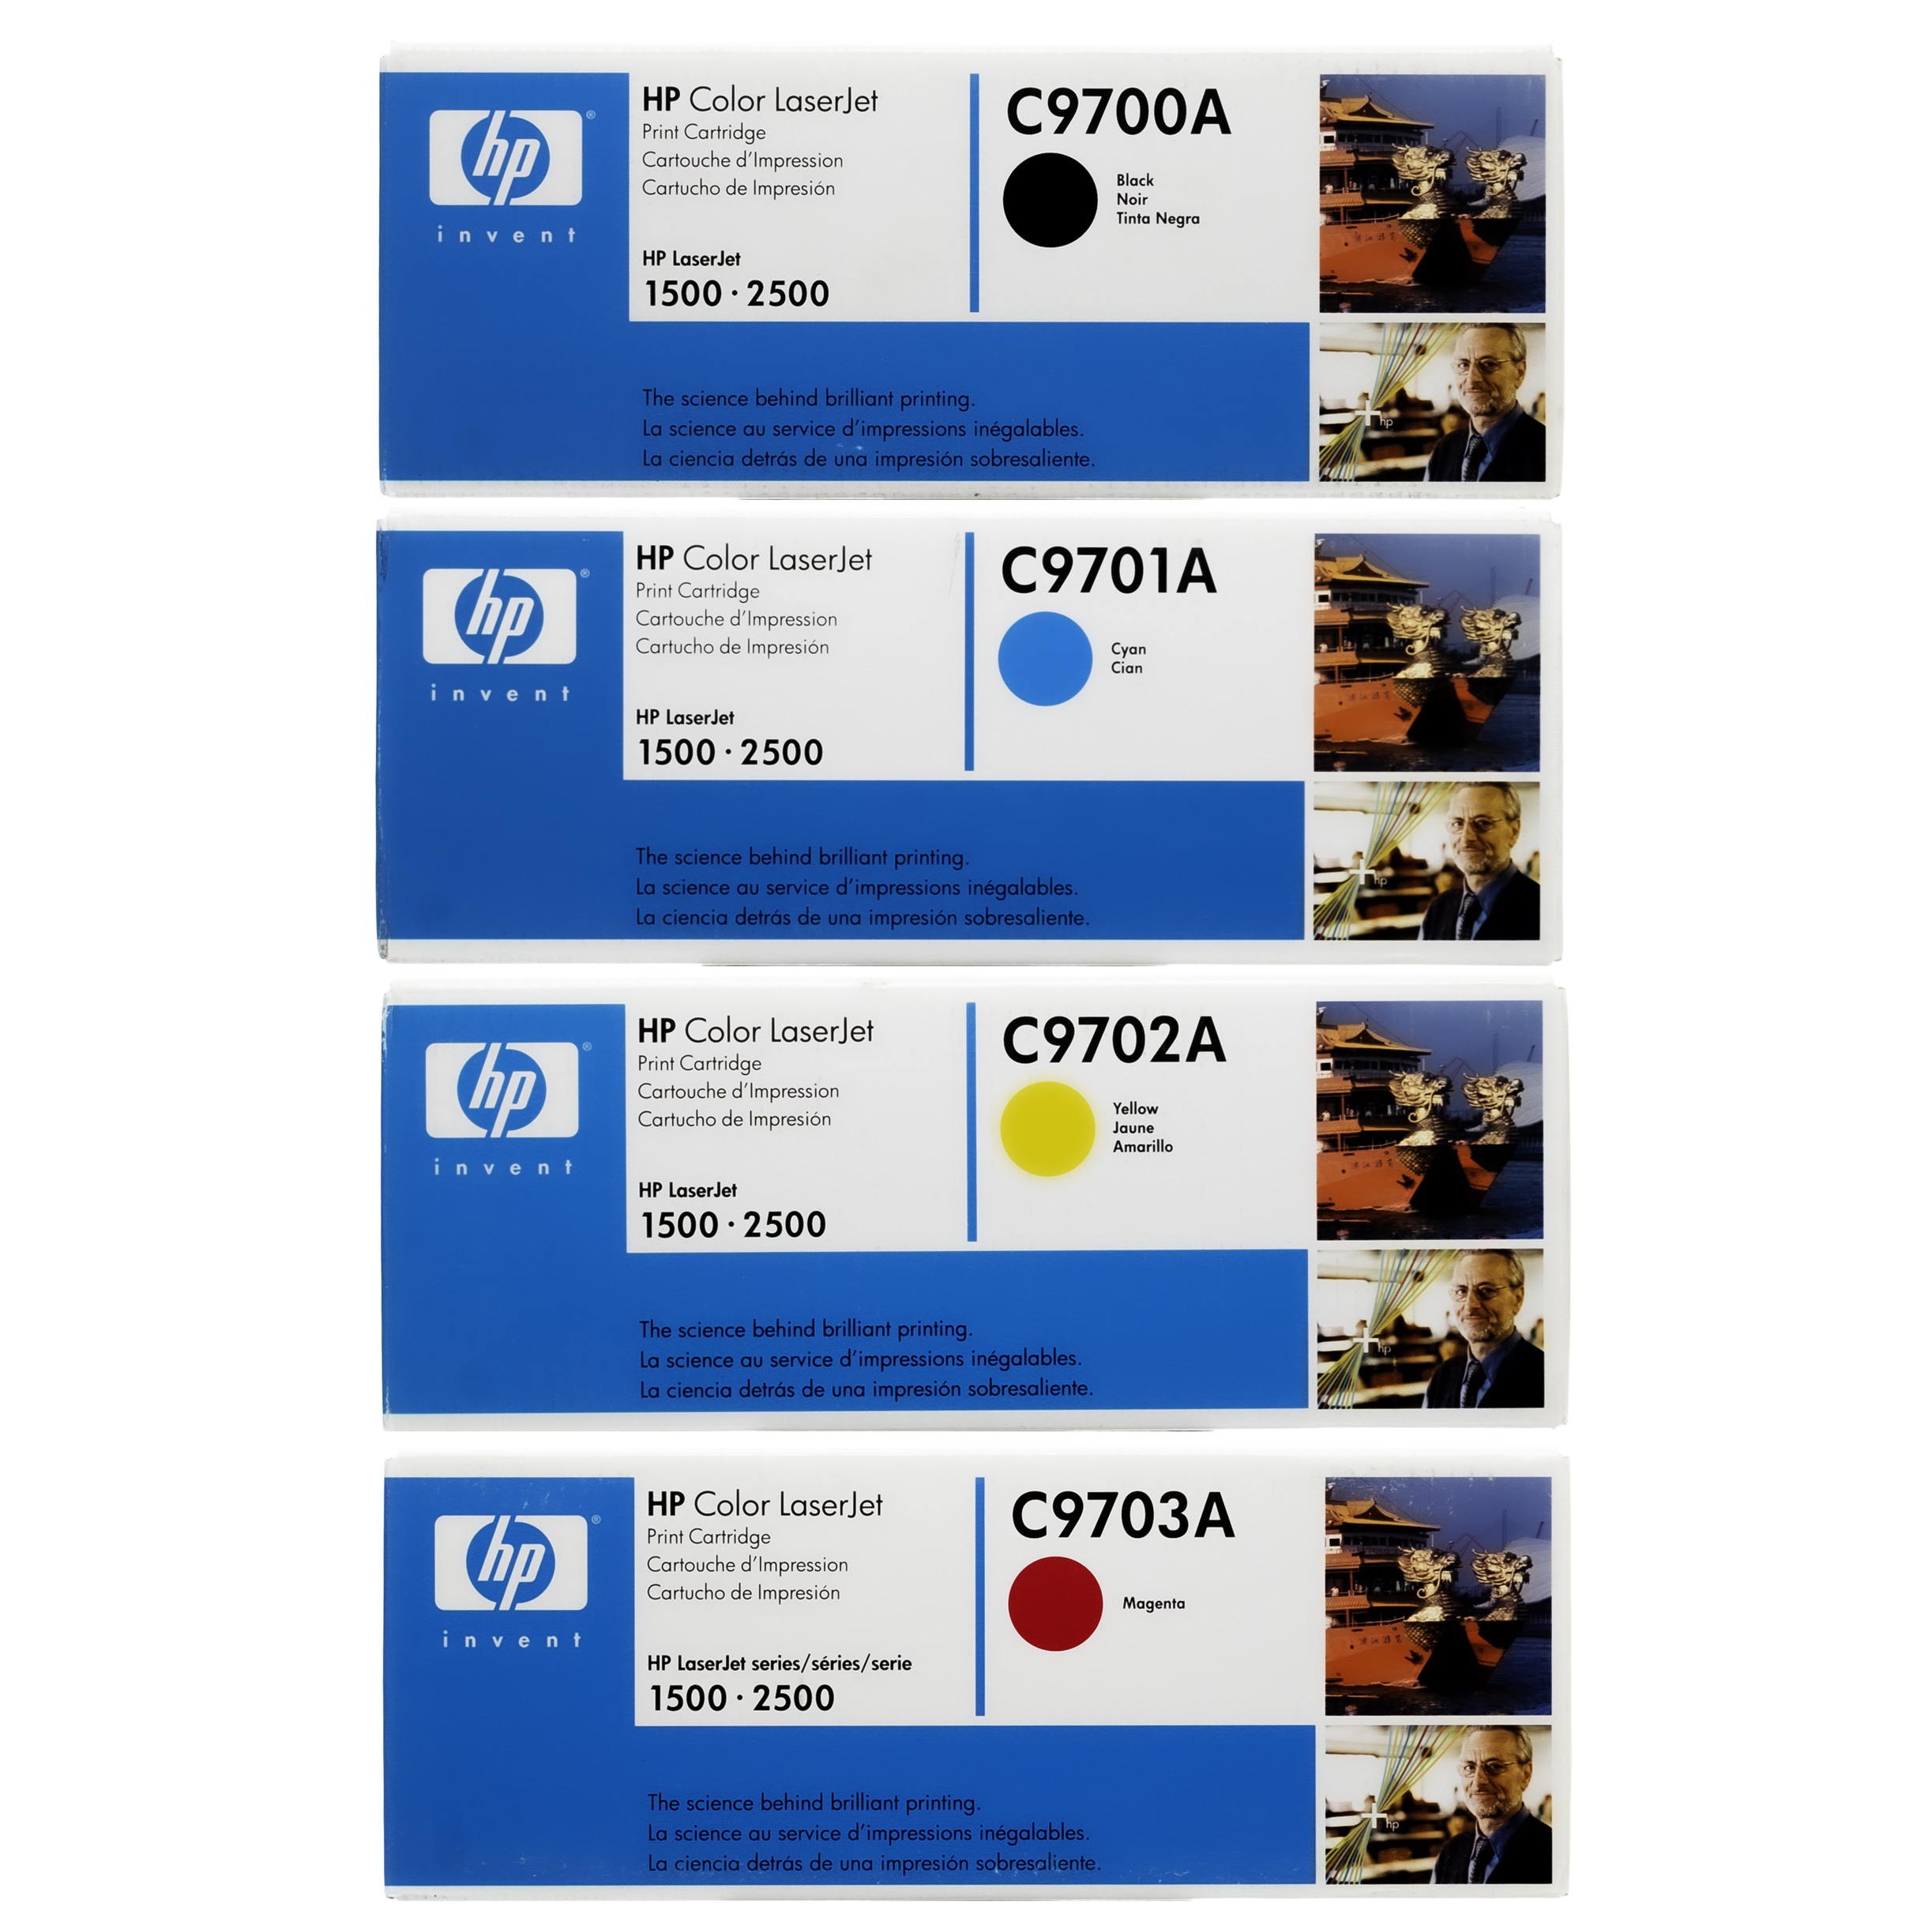 HP 121A SET | C9700A C9701A C9702A C9703A | Original Toner Cartridge - Black, Cyan, Yellow, Magenta